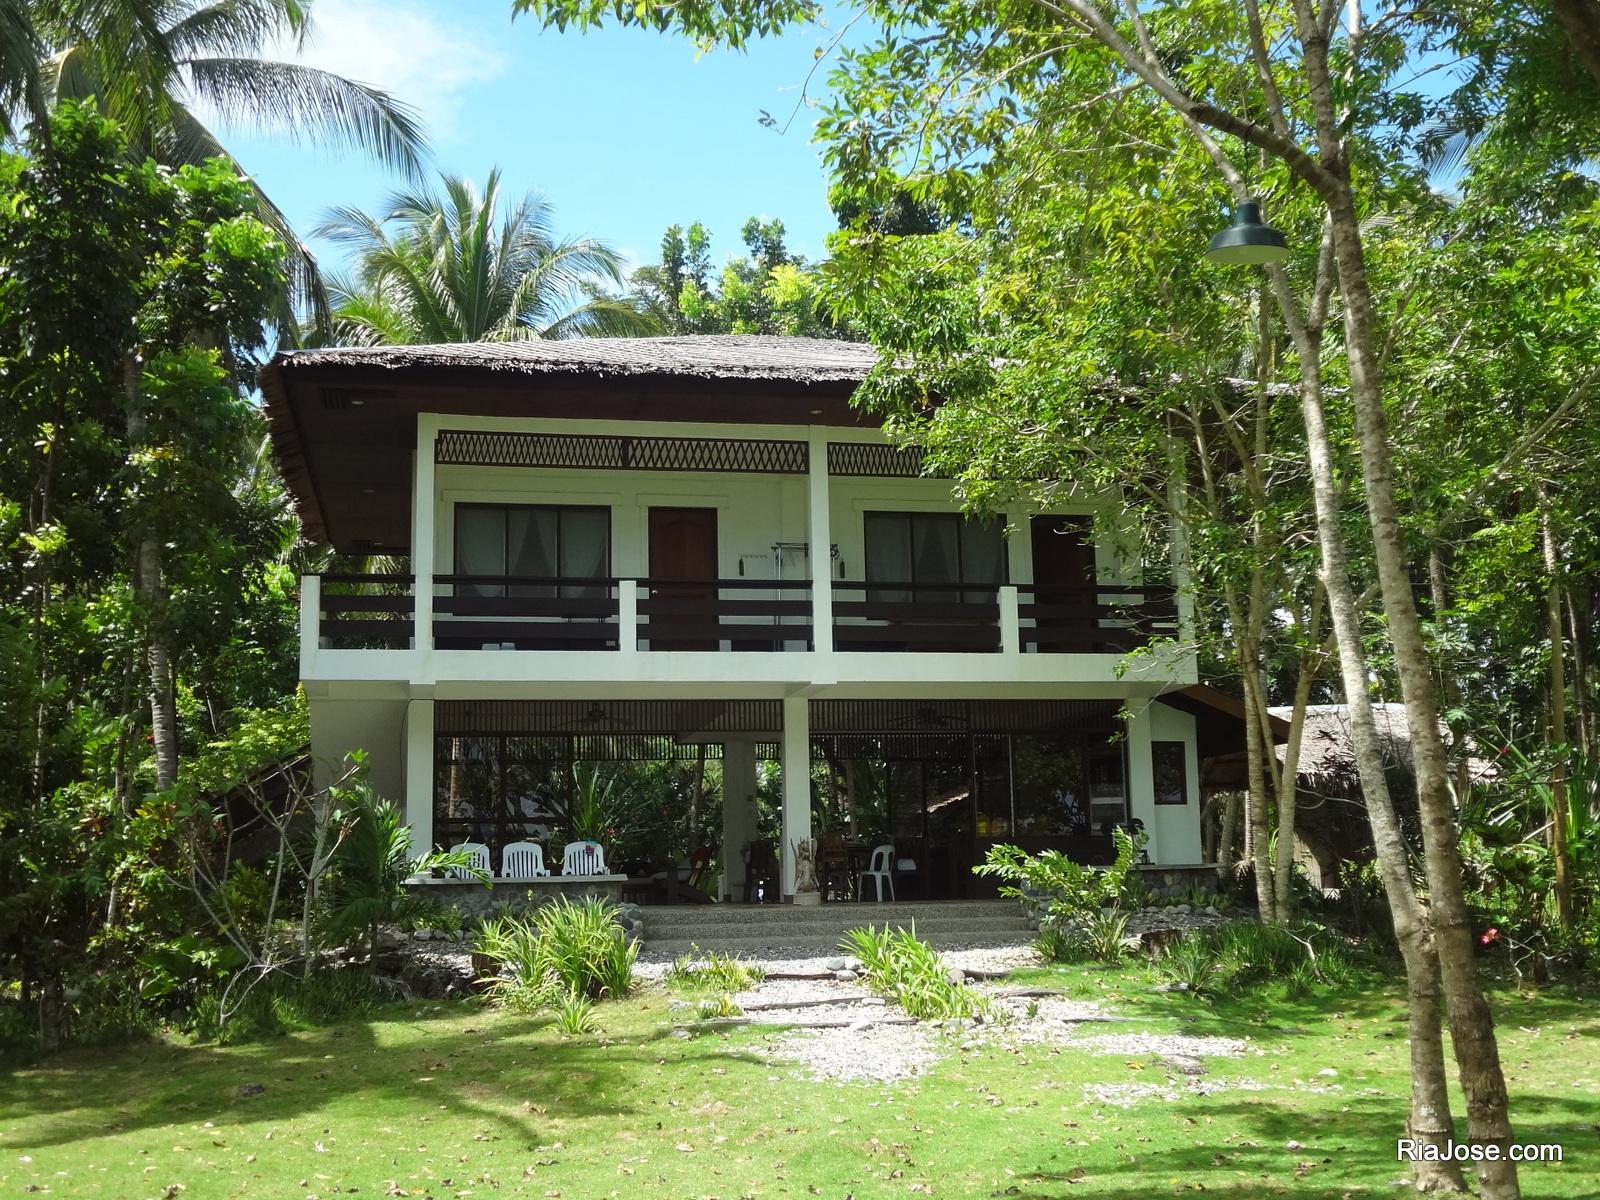 One of the houses in Kanakbai in Dahican, Mati, Davao Oriental